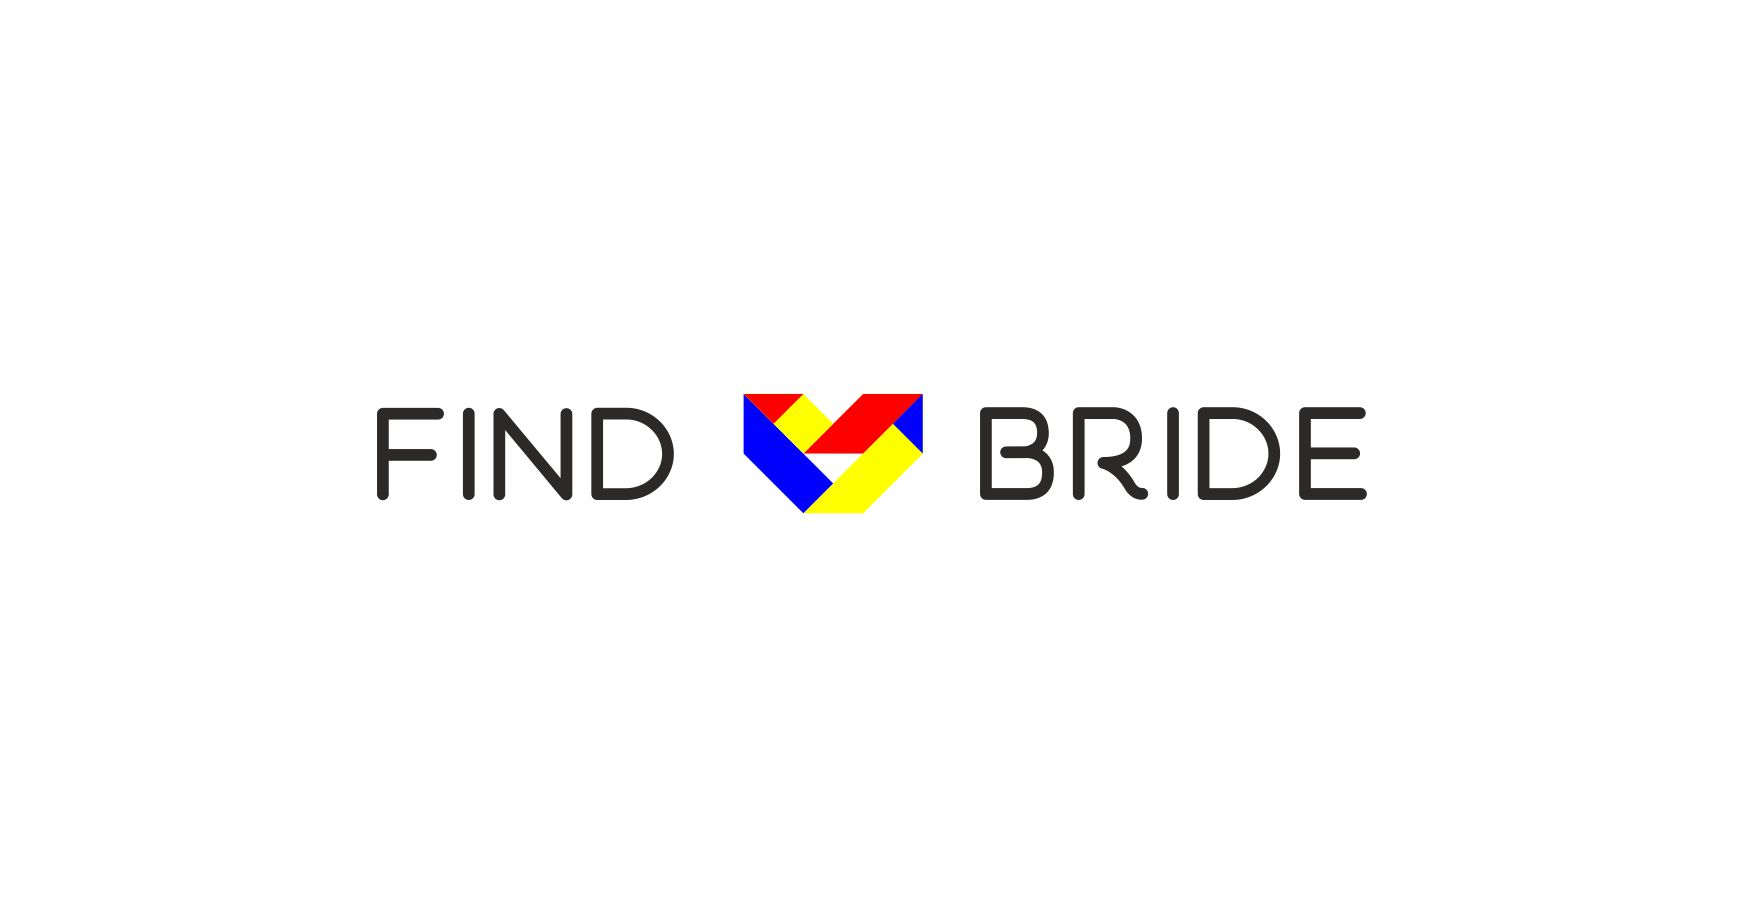 Нарисовать логотип сайта знакомств фото f_7975ad2ee2a54898.jpg